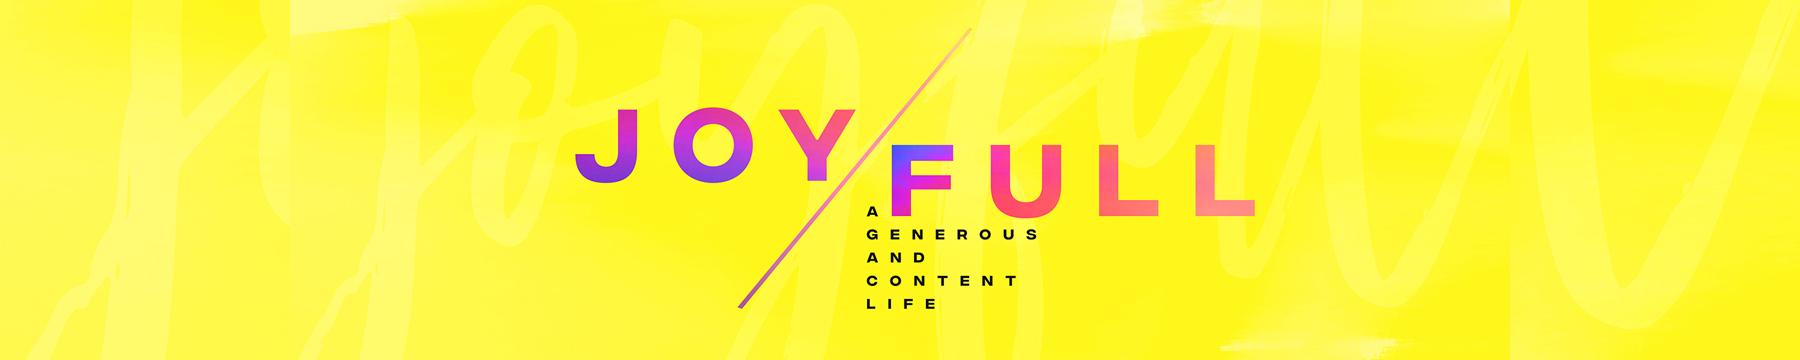 Our Current Sermon Series: JoyFull